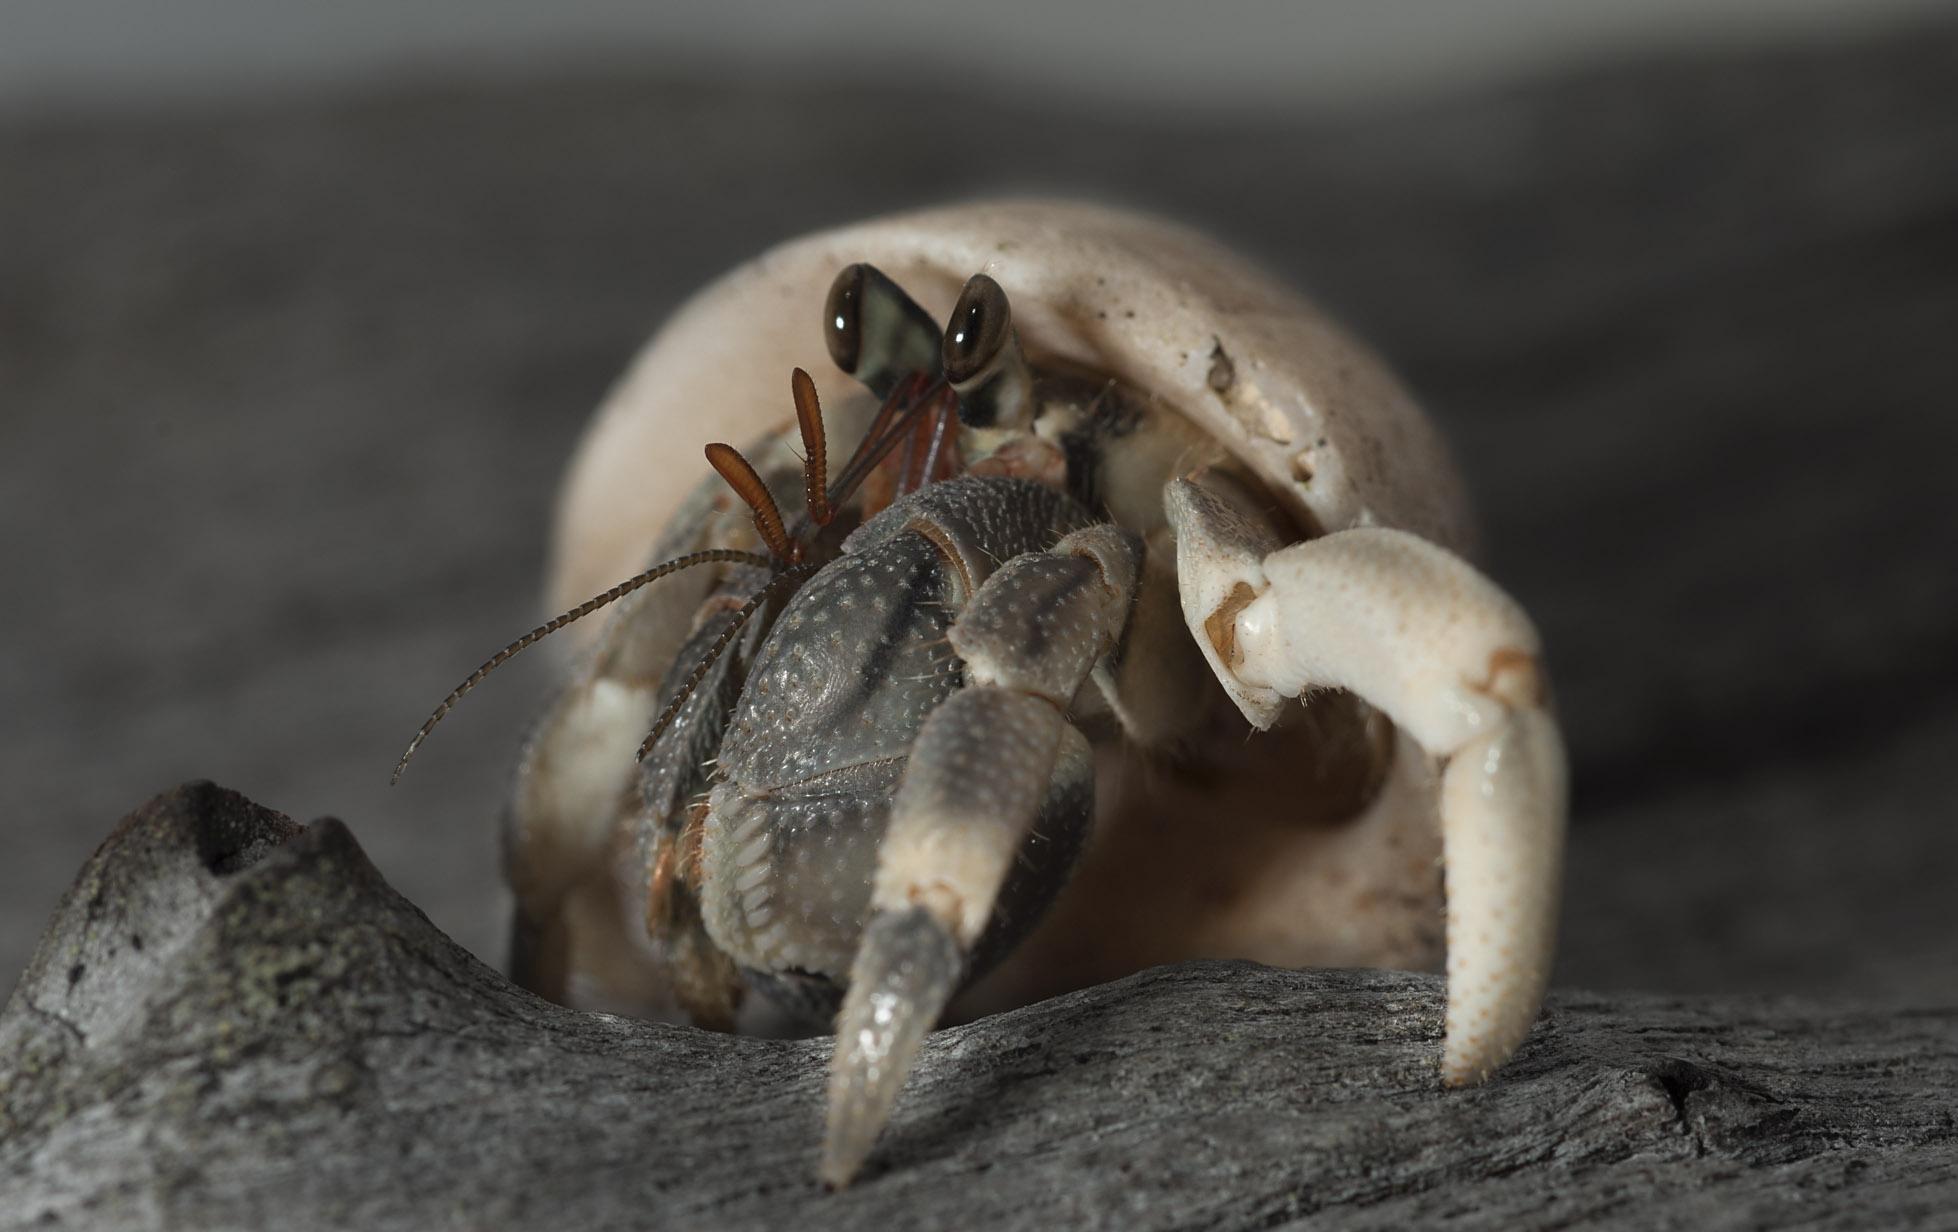 Hermit-crab_20110729_Turtle_Bay_Santo_Vanuatu_1.jpg